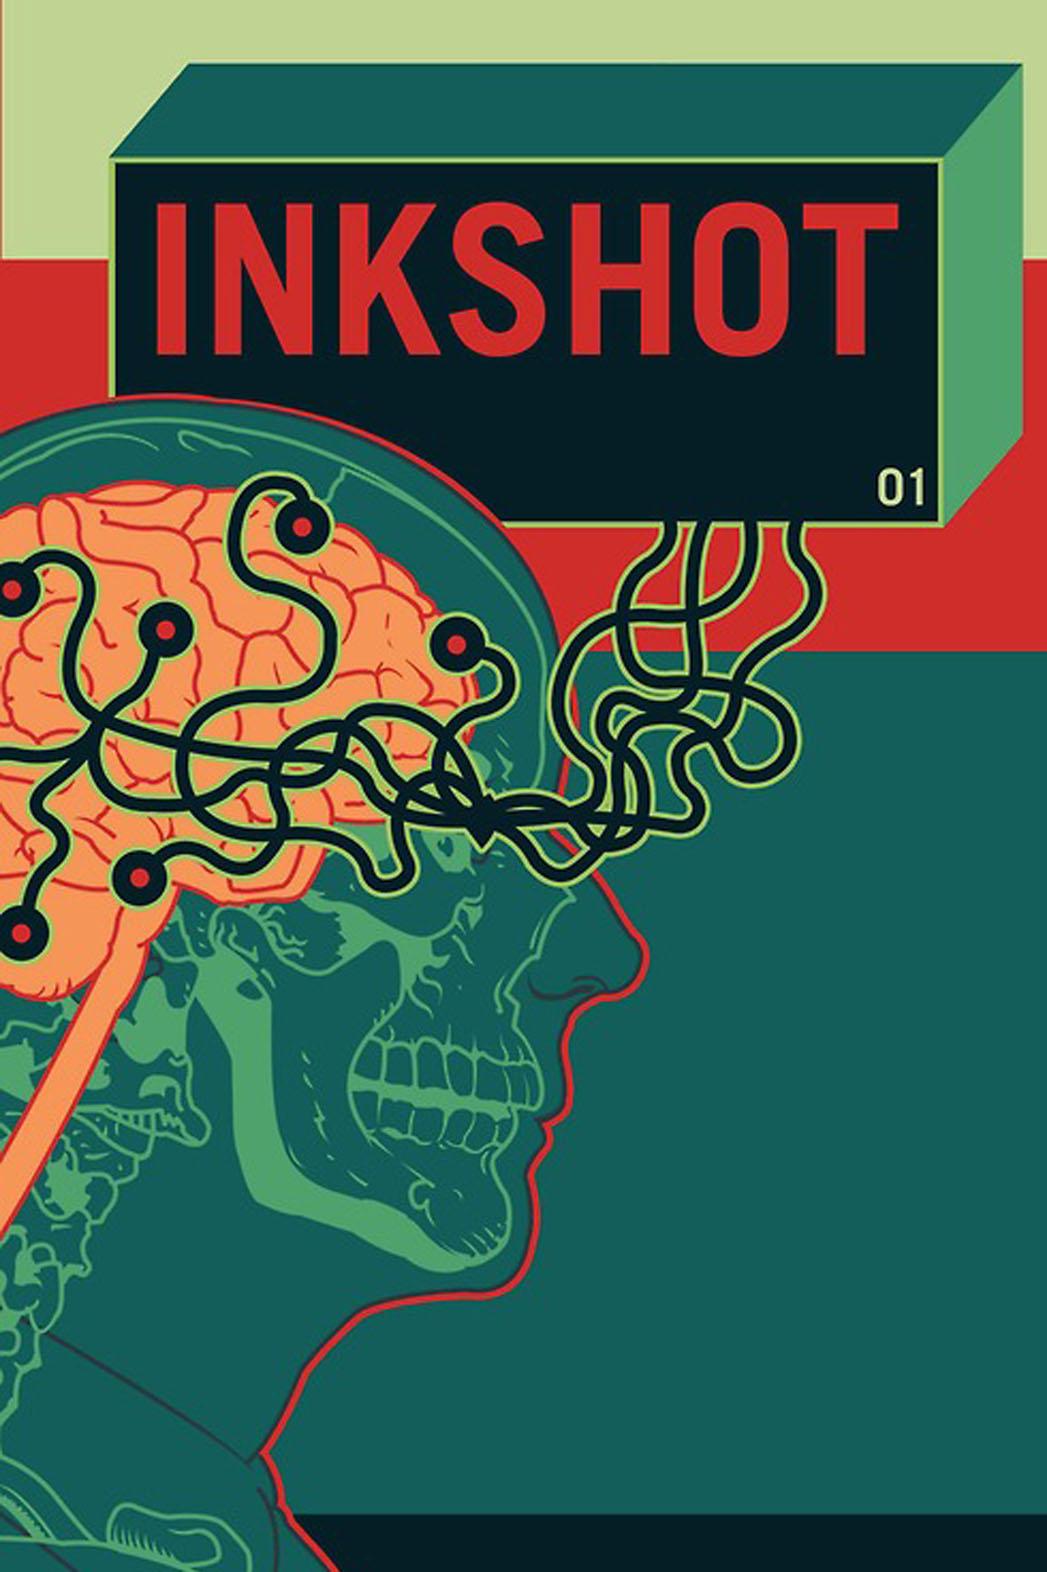 Inkshot 01 Cover Art - P 2013